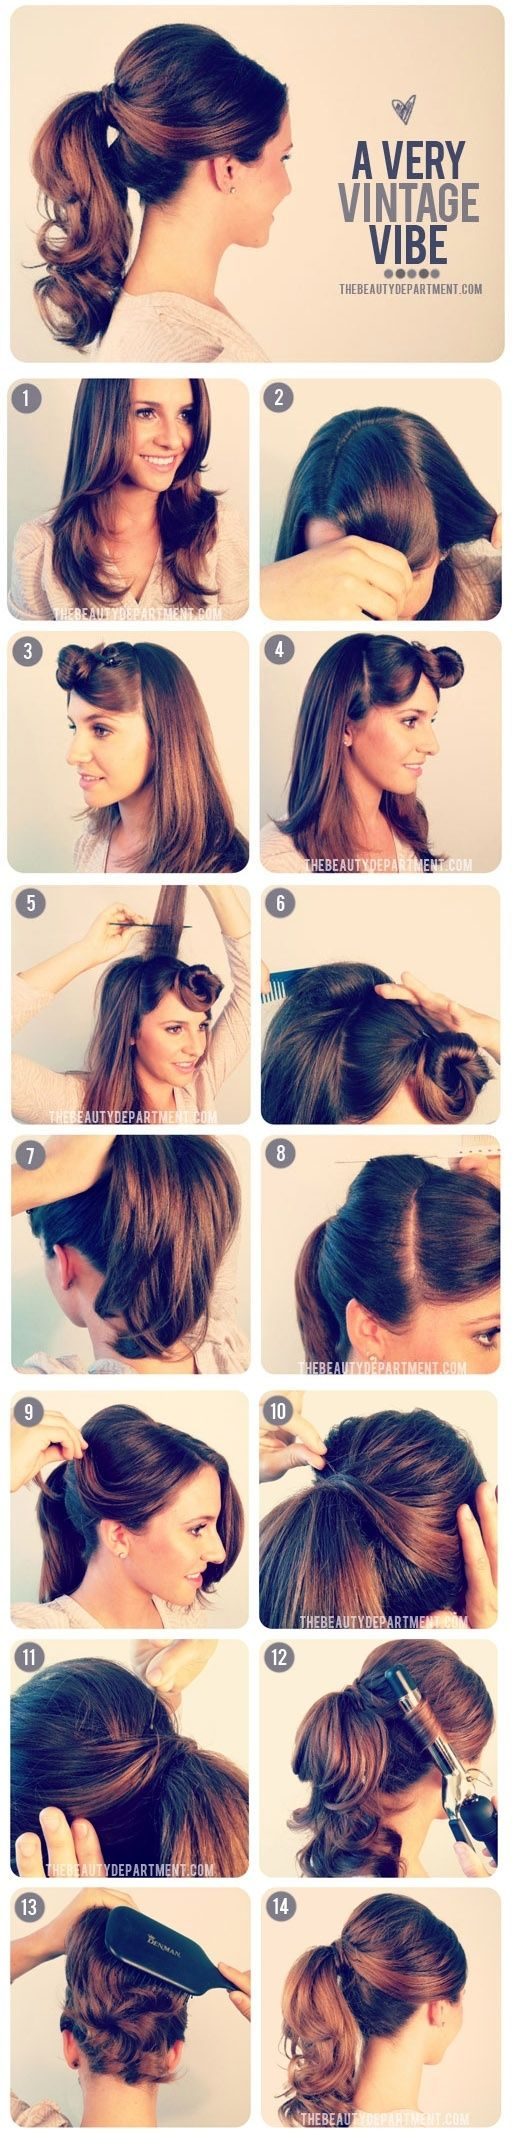 A vintage ponytail.